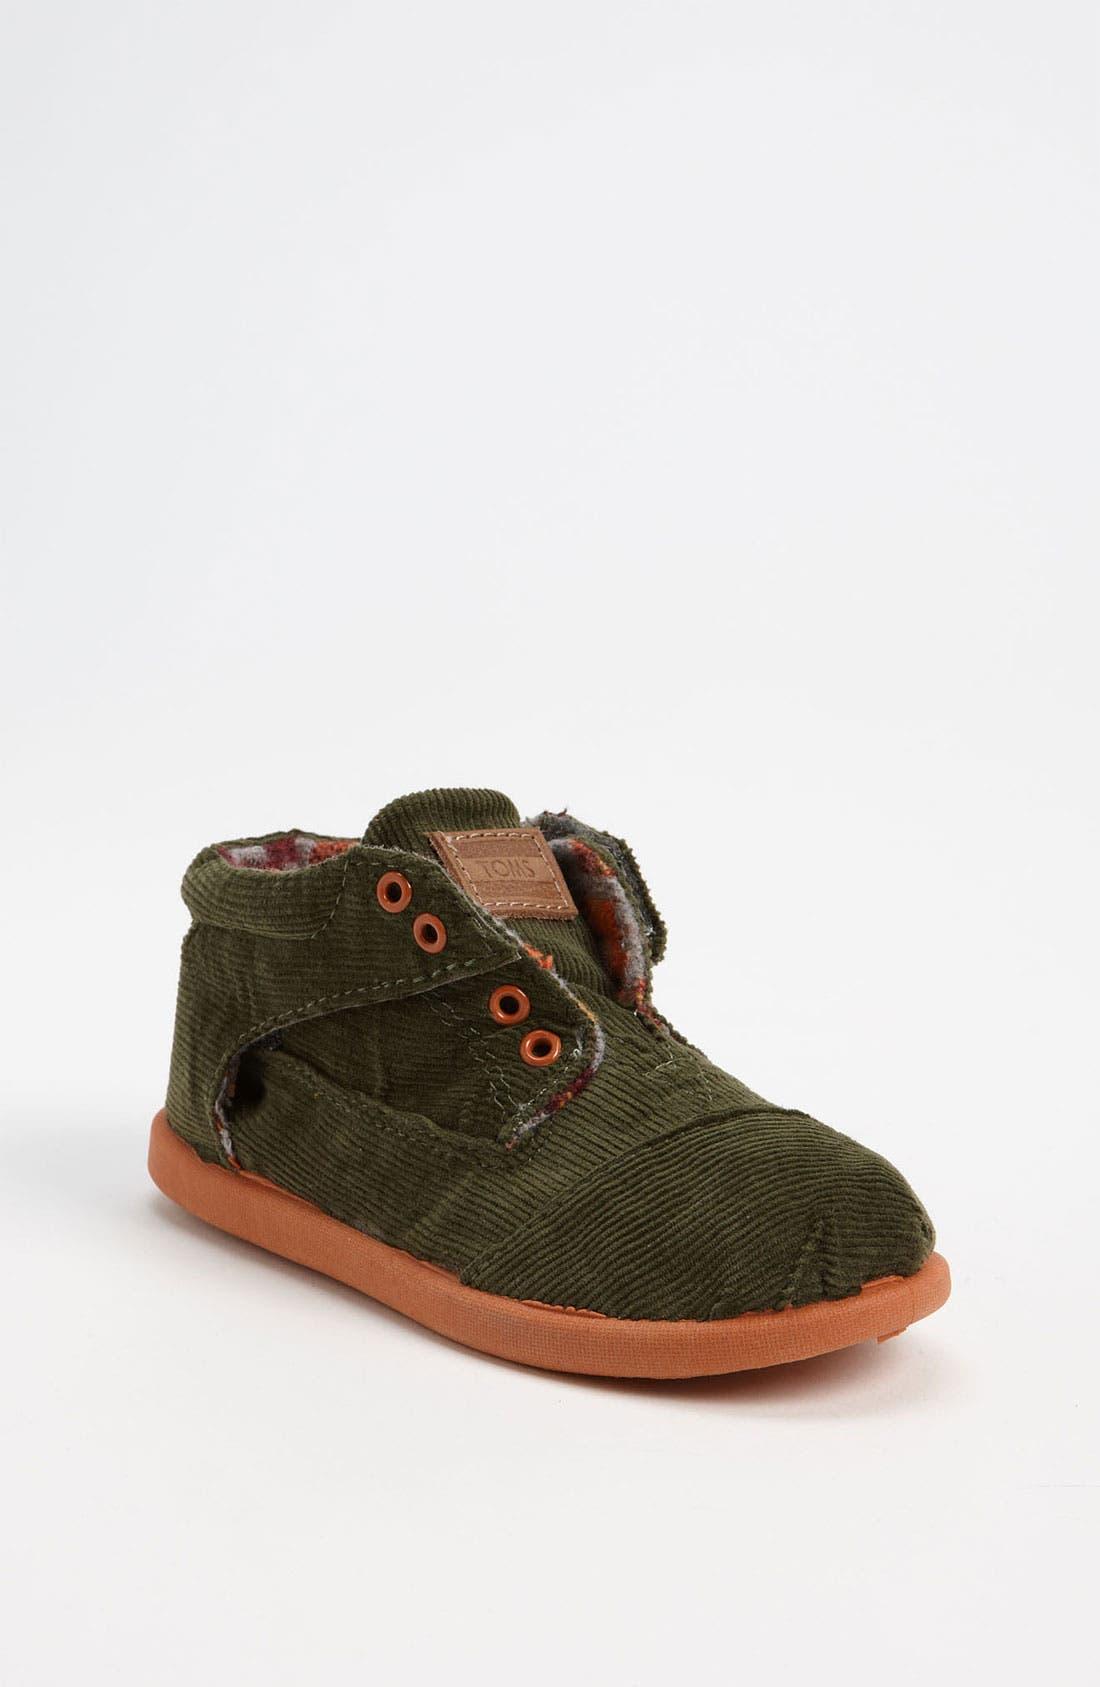 Alternate Image 1 Selected - TOMS 'Botas' Corduroy Boot (Baby, Walker & Toddler)